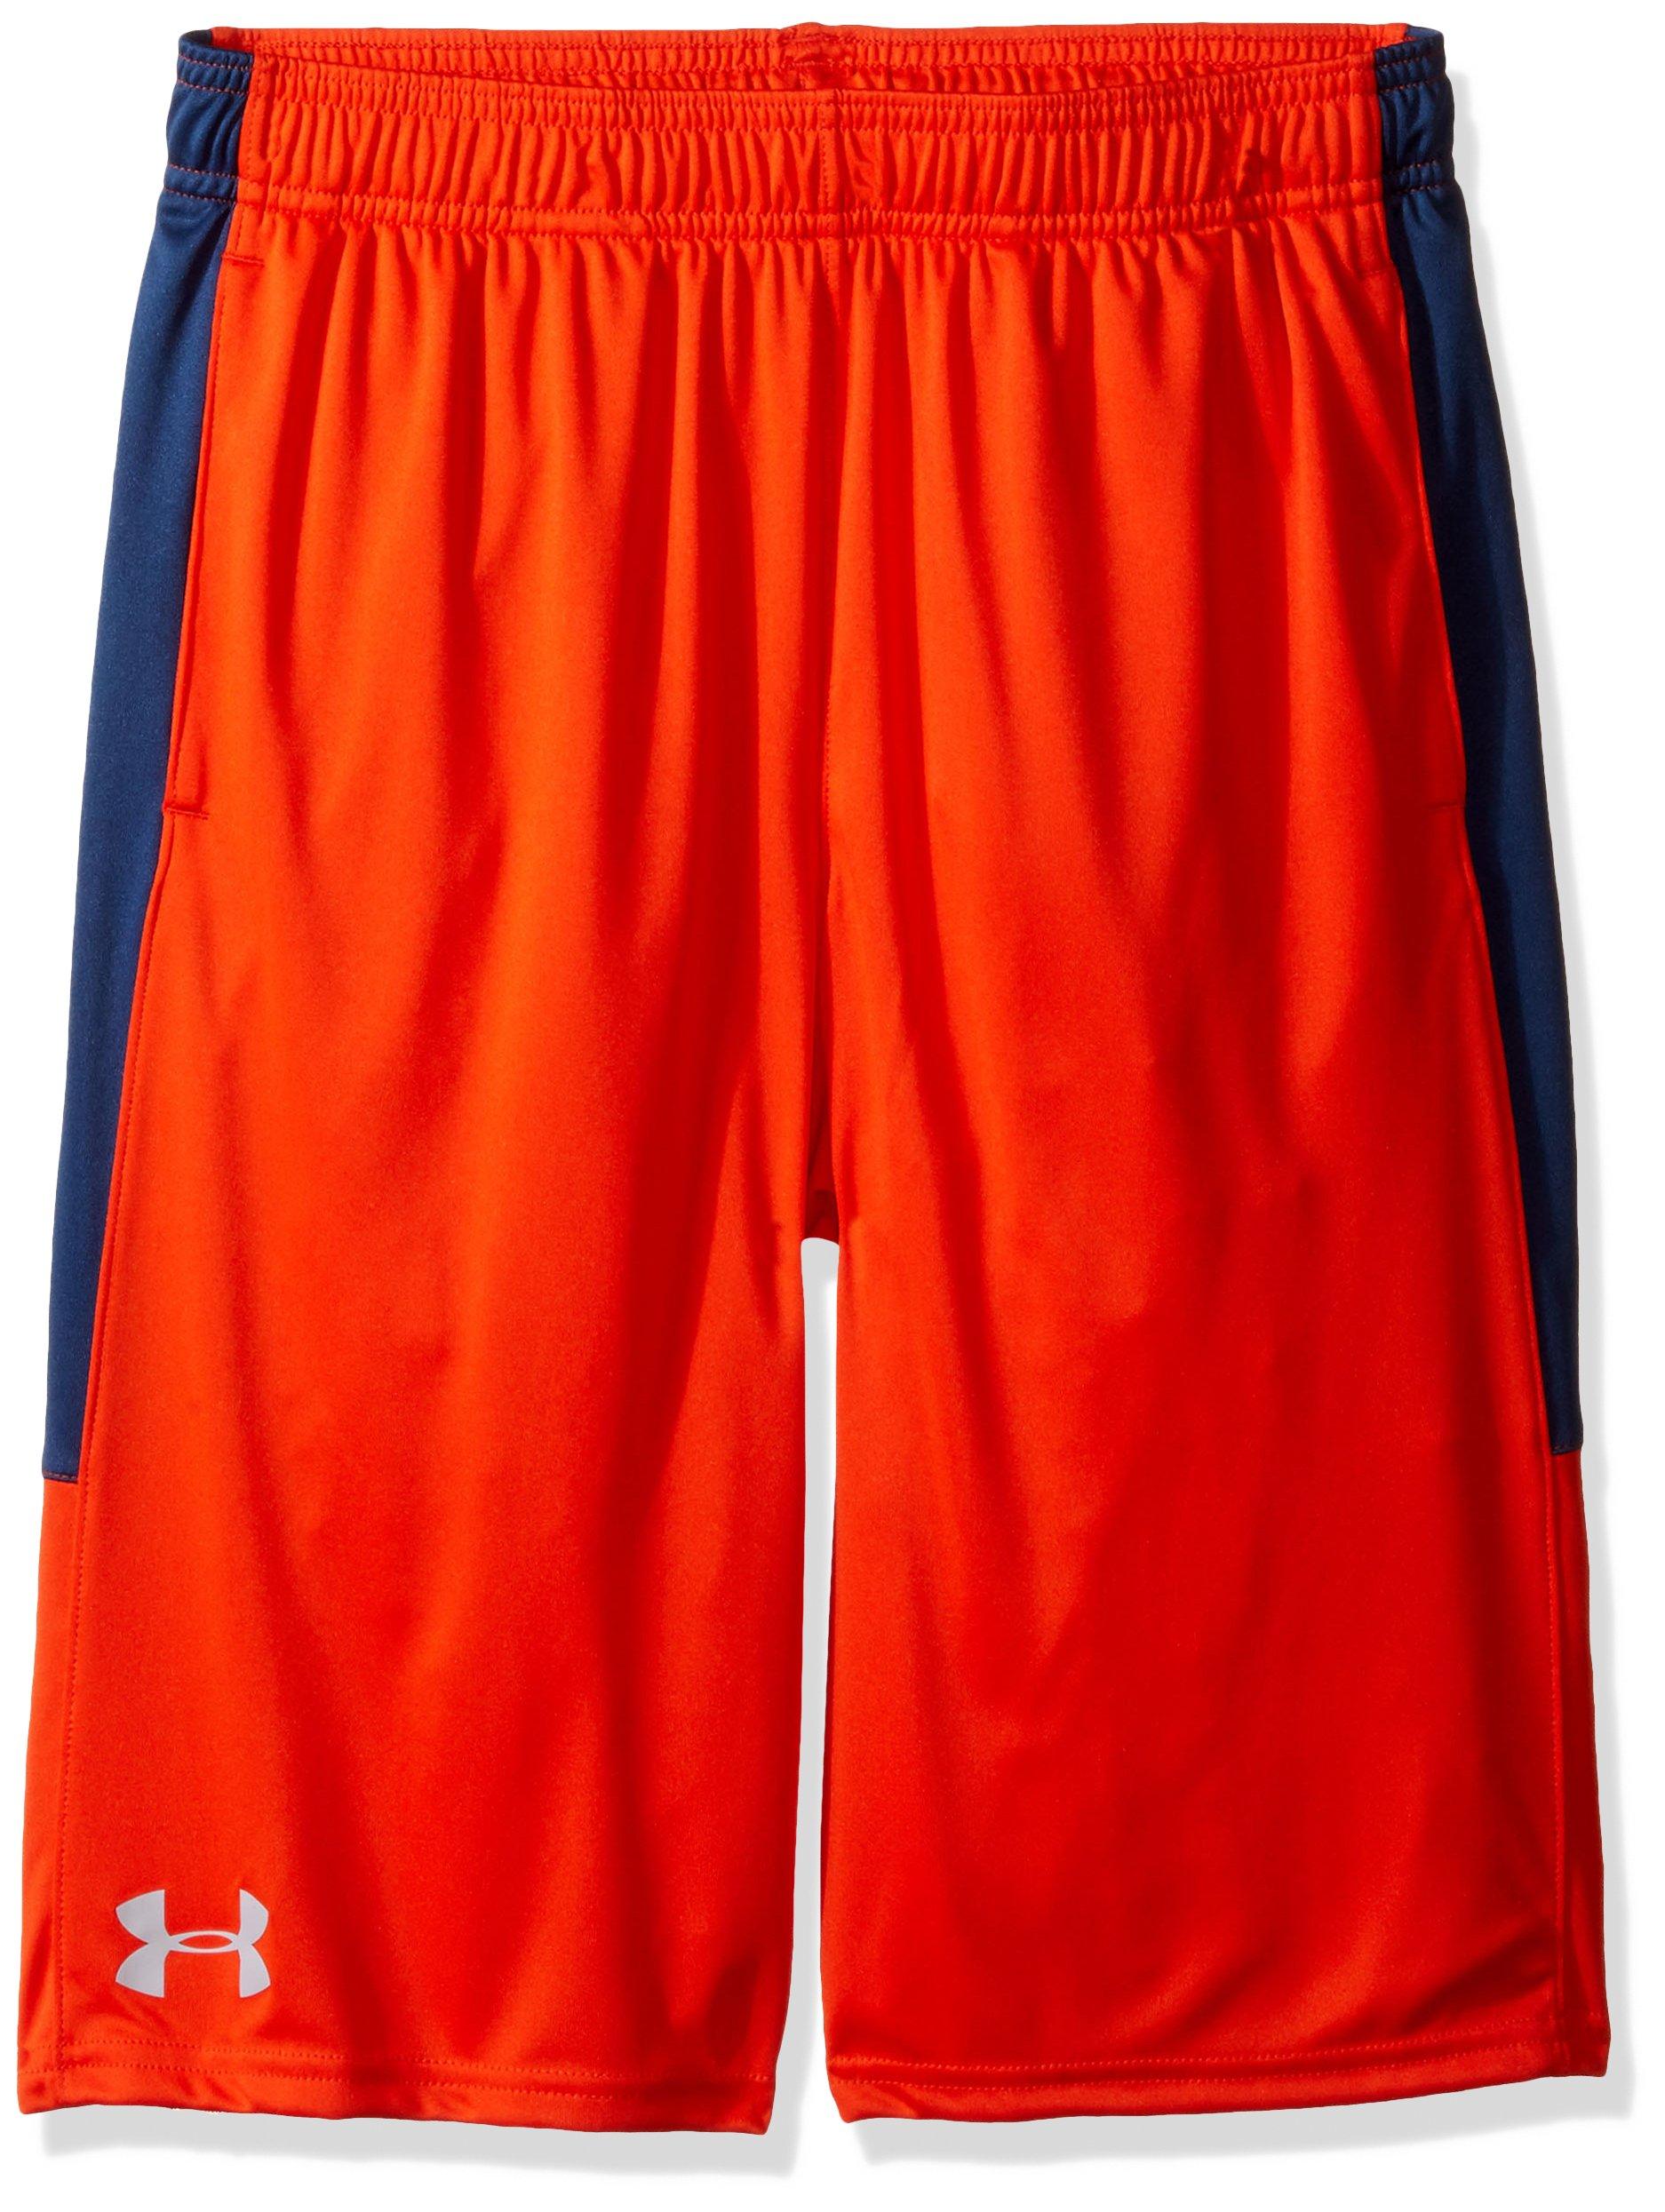 Under Armour Boys Instinct Shorts,Dark Orange /Overcast Gray Youth Small